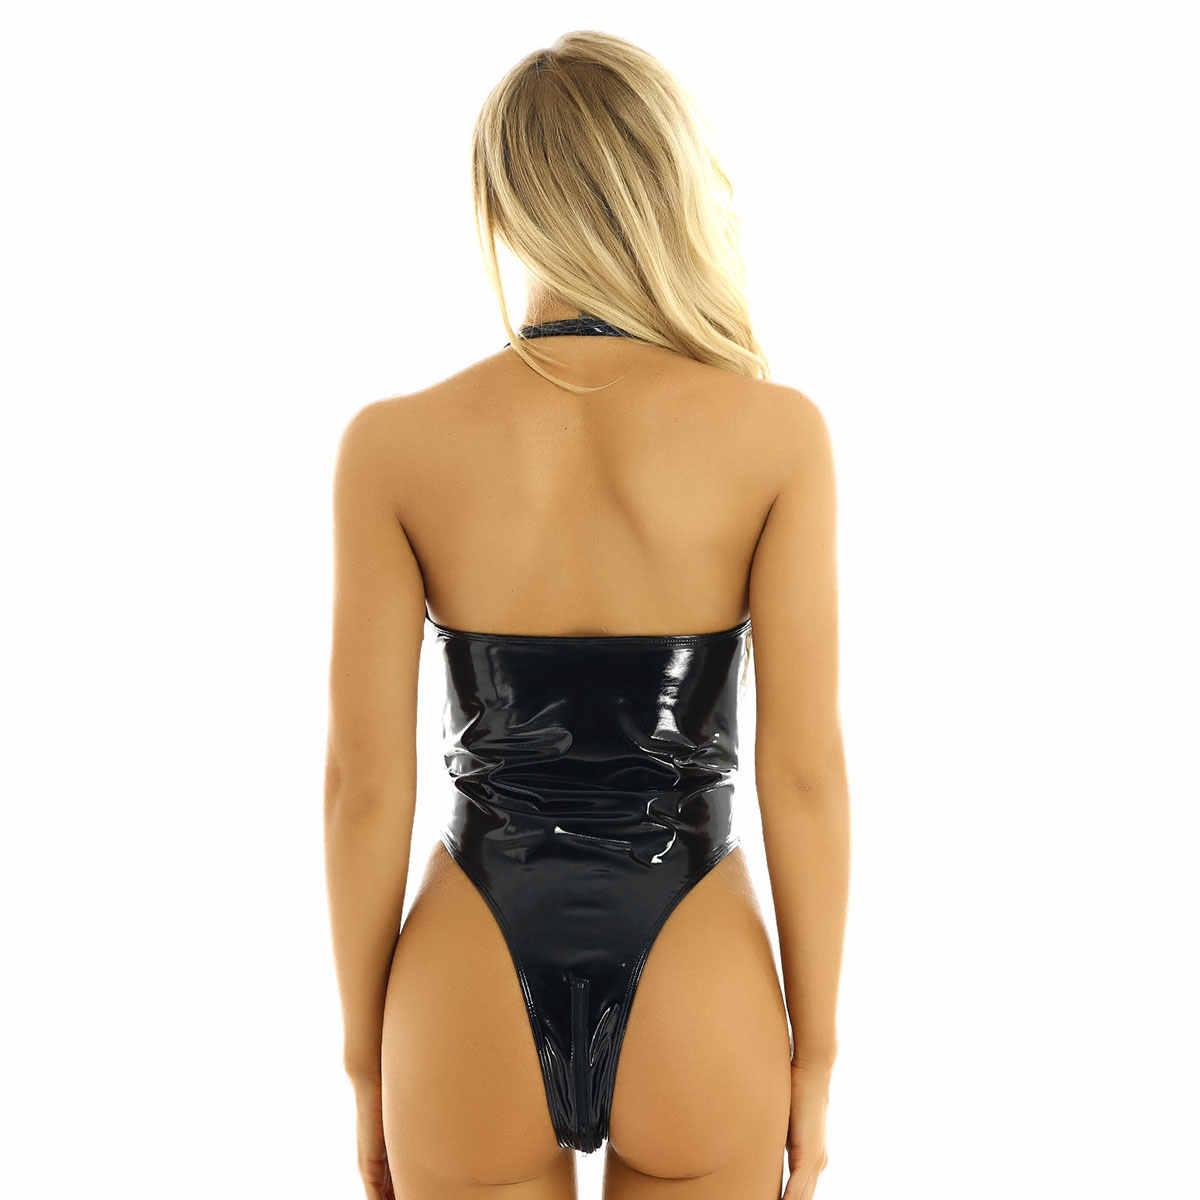 Vrouwen Dames Hot Lingerie Een Stuk Rits Crotchless Bodysuit Latex Catsuit Wet Look Lakleer Teddy Bodysuit Rave Outfits